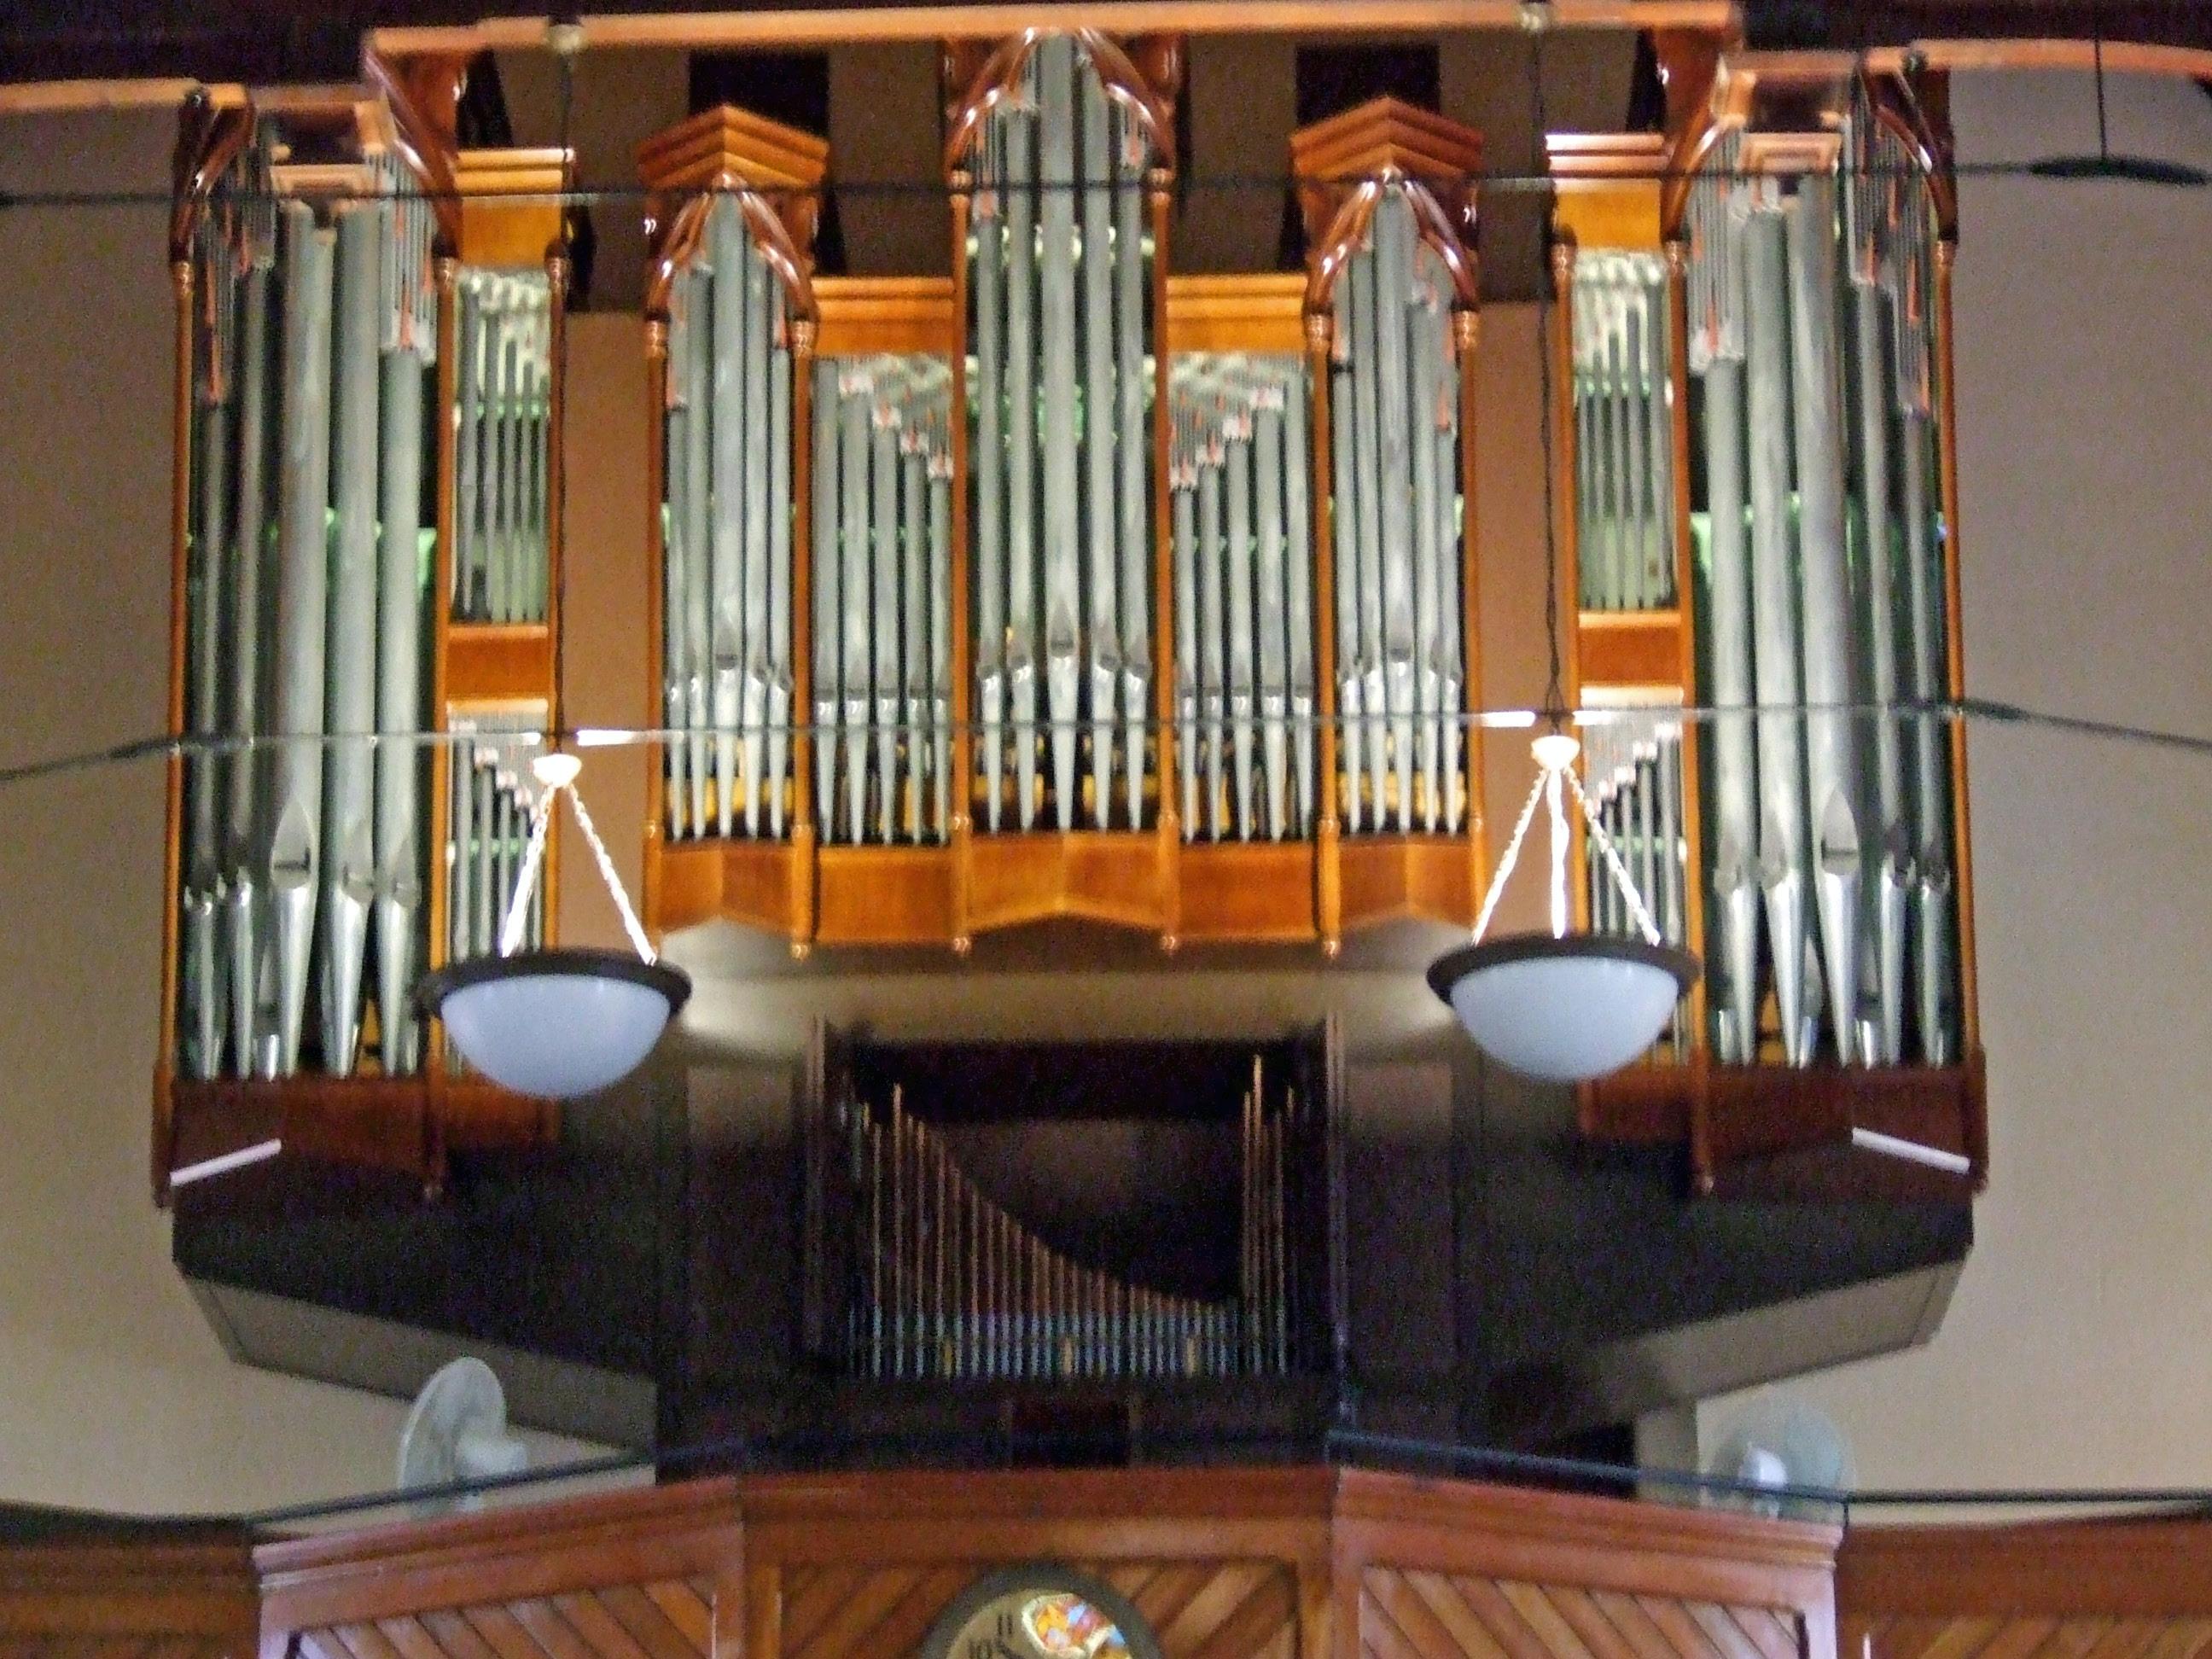 Pipe or Electronic Organ